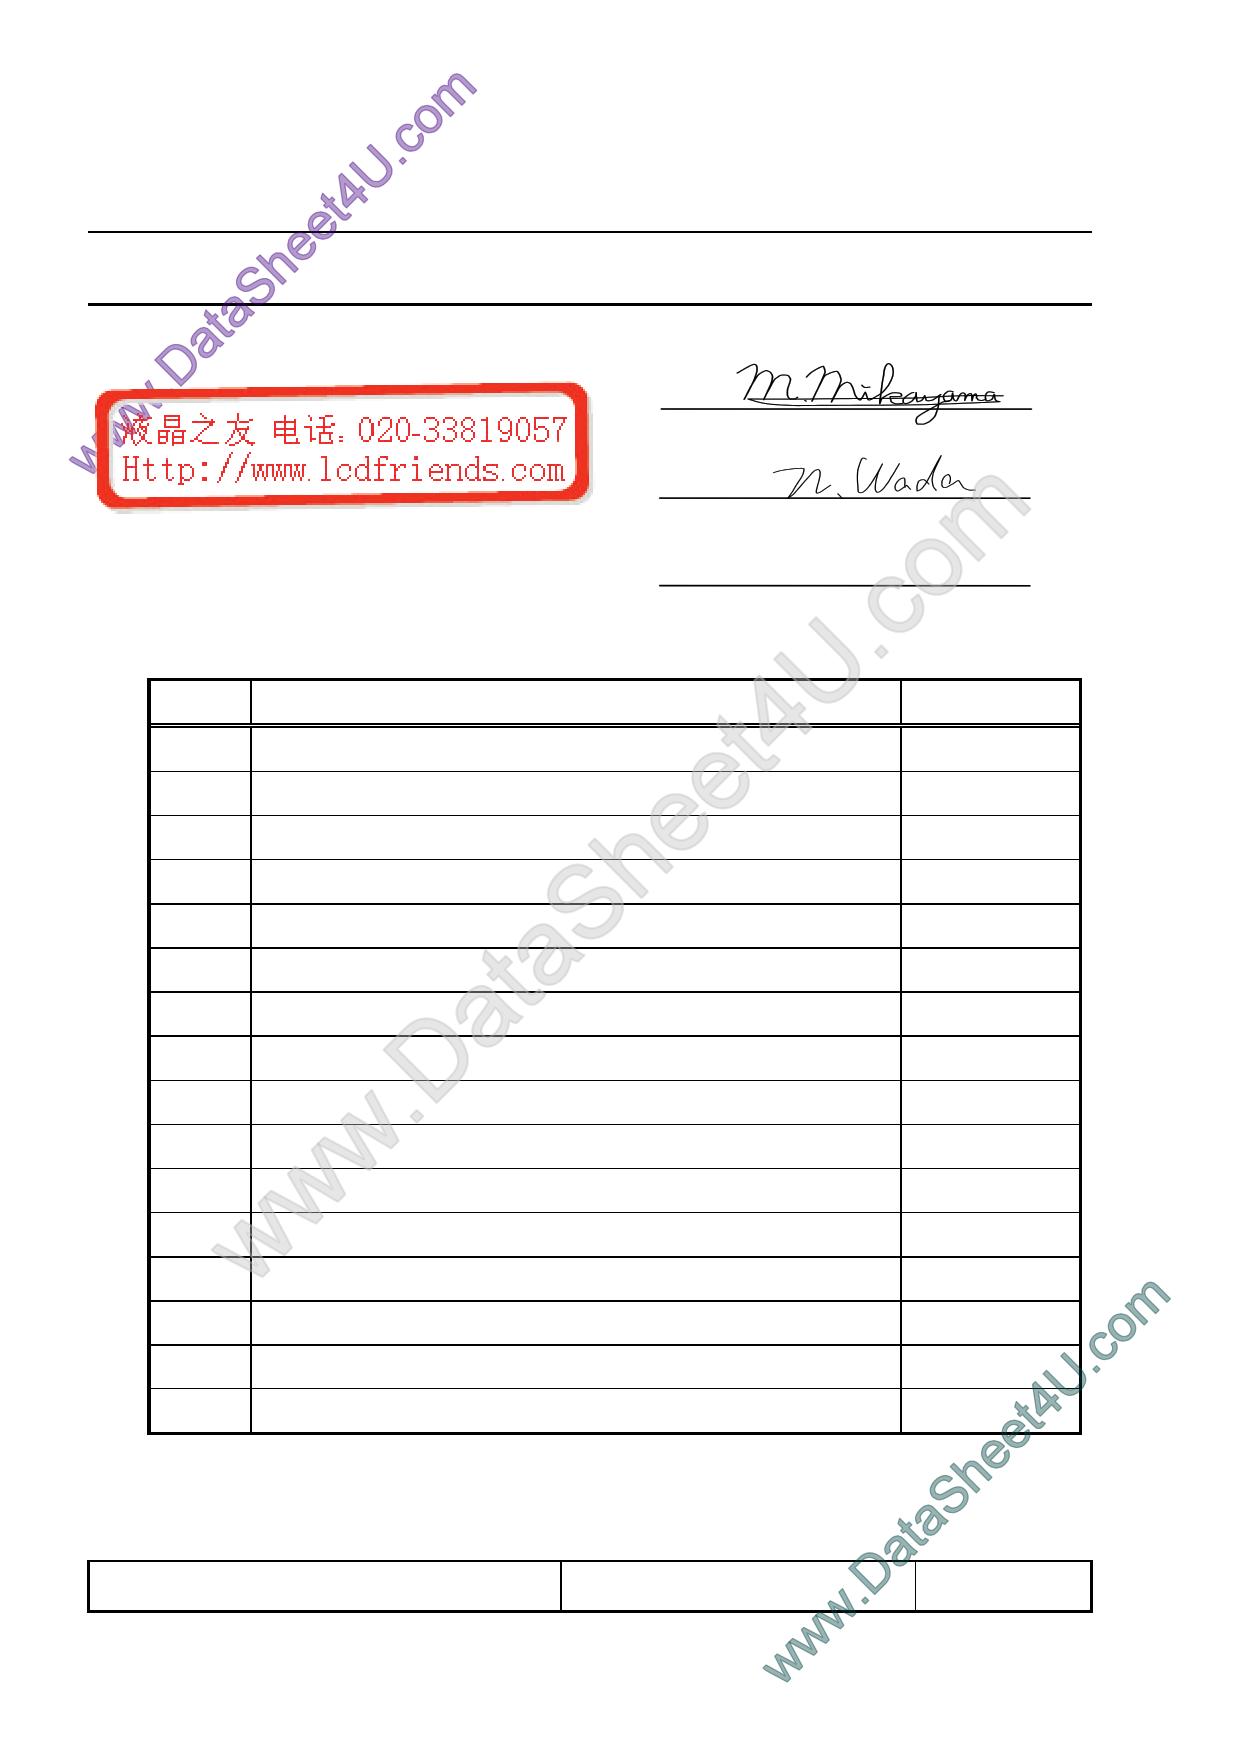 T-51638D084J-FW-A-AC دیتاشیت PDF